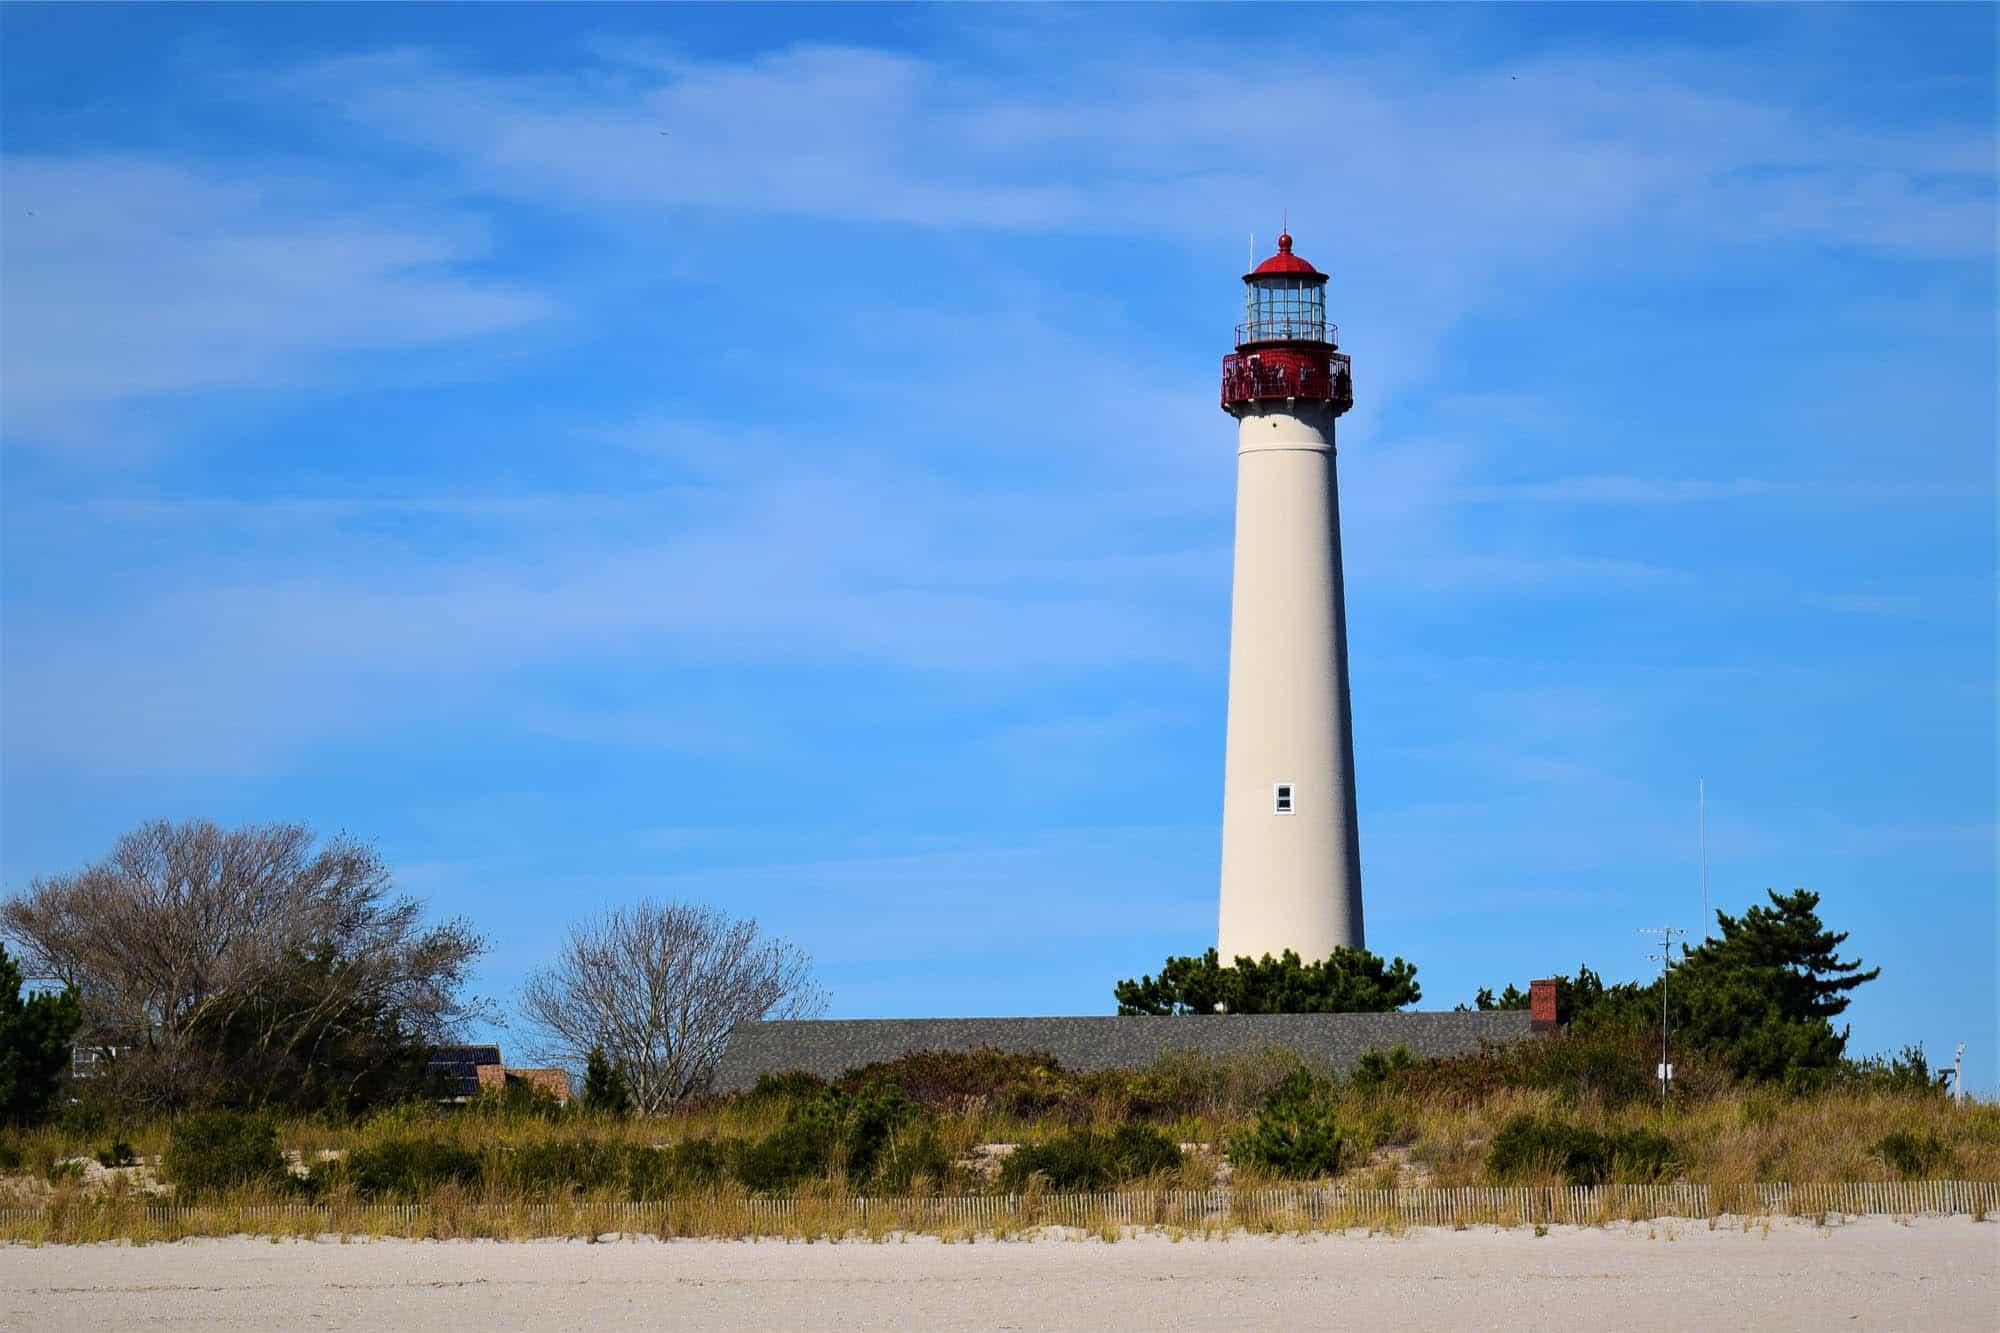 Cape May Lighthouse above sandy beach